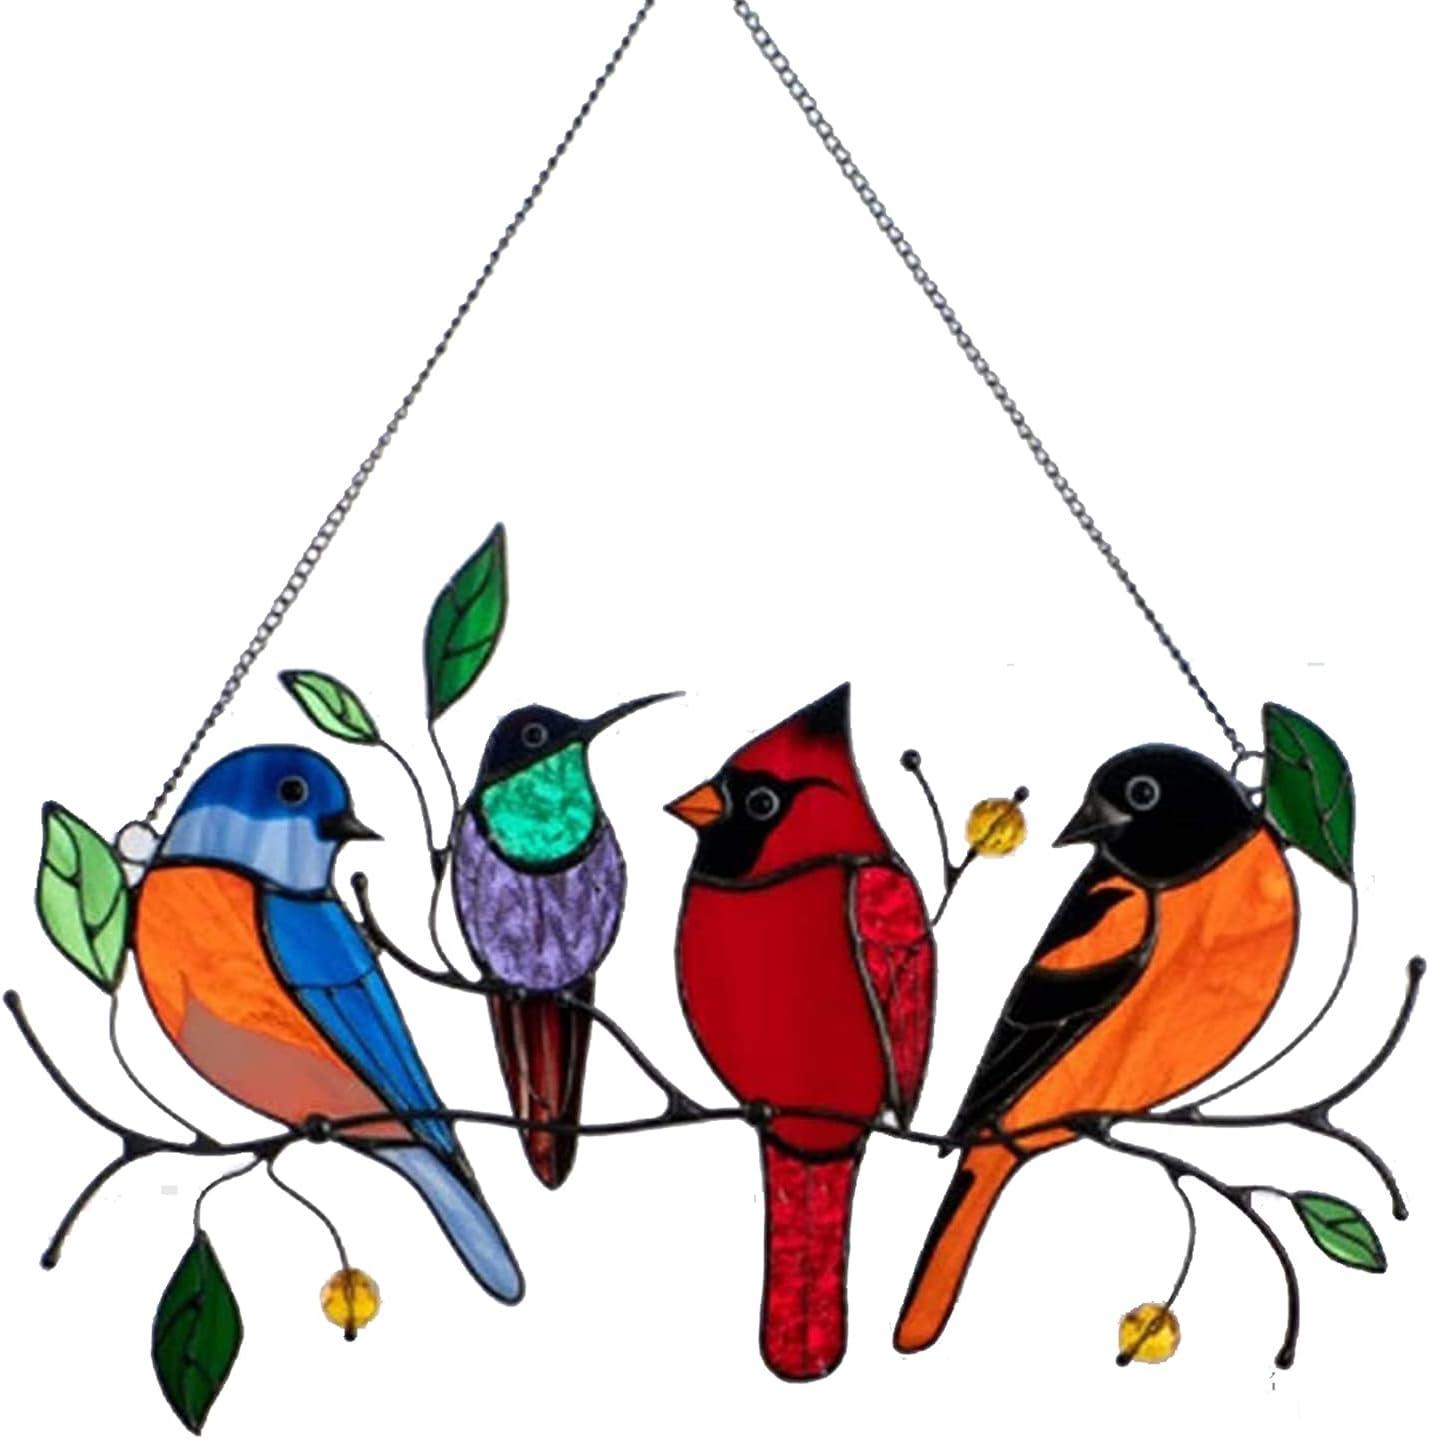 Multicolor Birds On-A-Wire, Metal Suncatcher Window Panel, Bird Series Art Ornaments Pendant Hanging for Windows or Doors Home Decoration, Gifts for Bird Lovers (4 Birds)